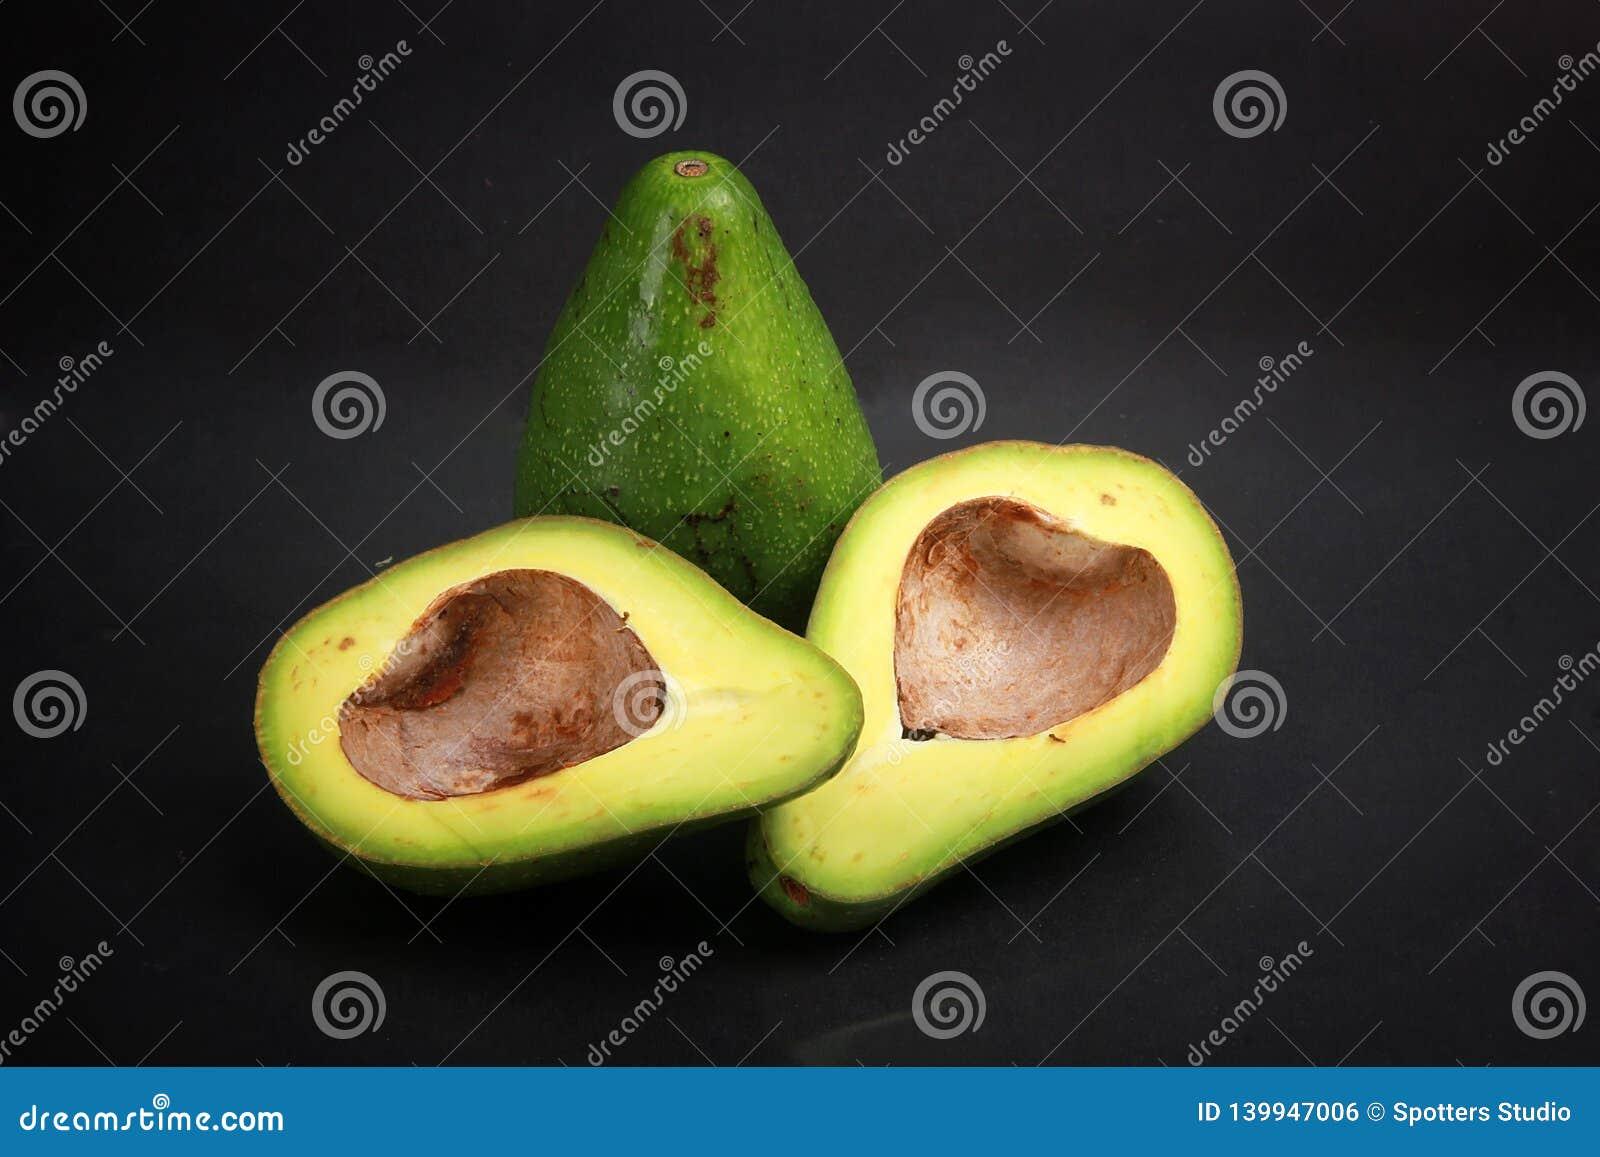 Zwarte geïsoleerde avocado als achtergrond